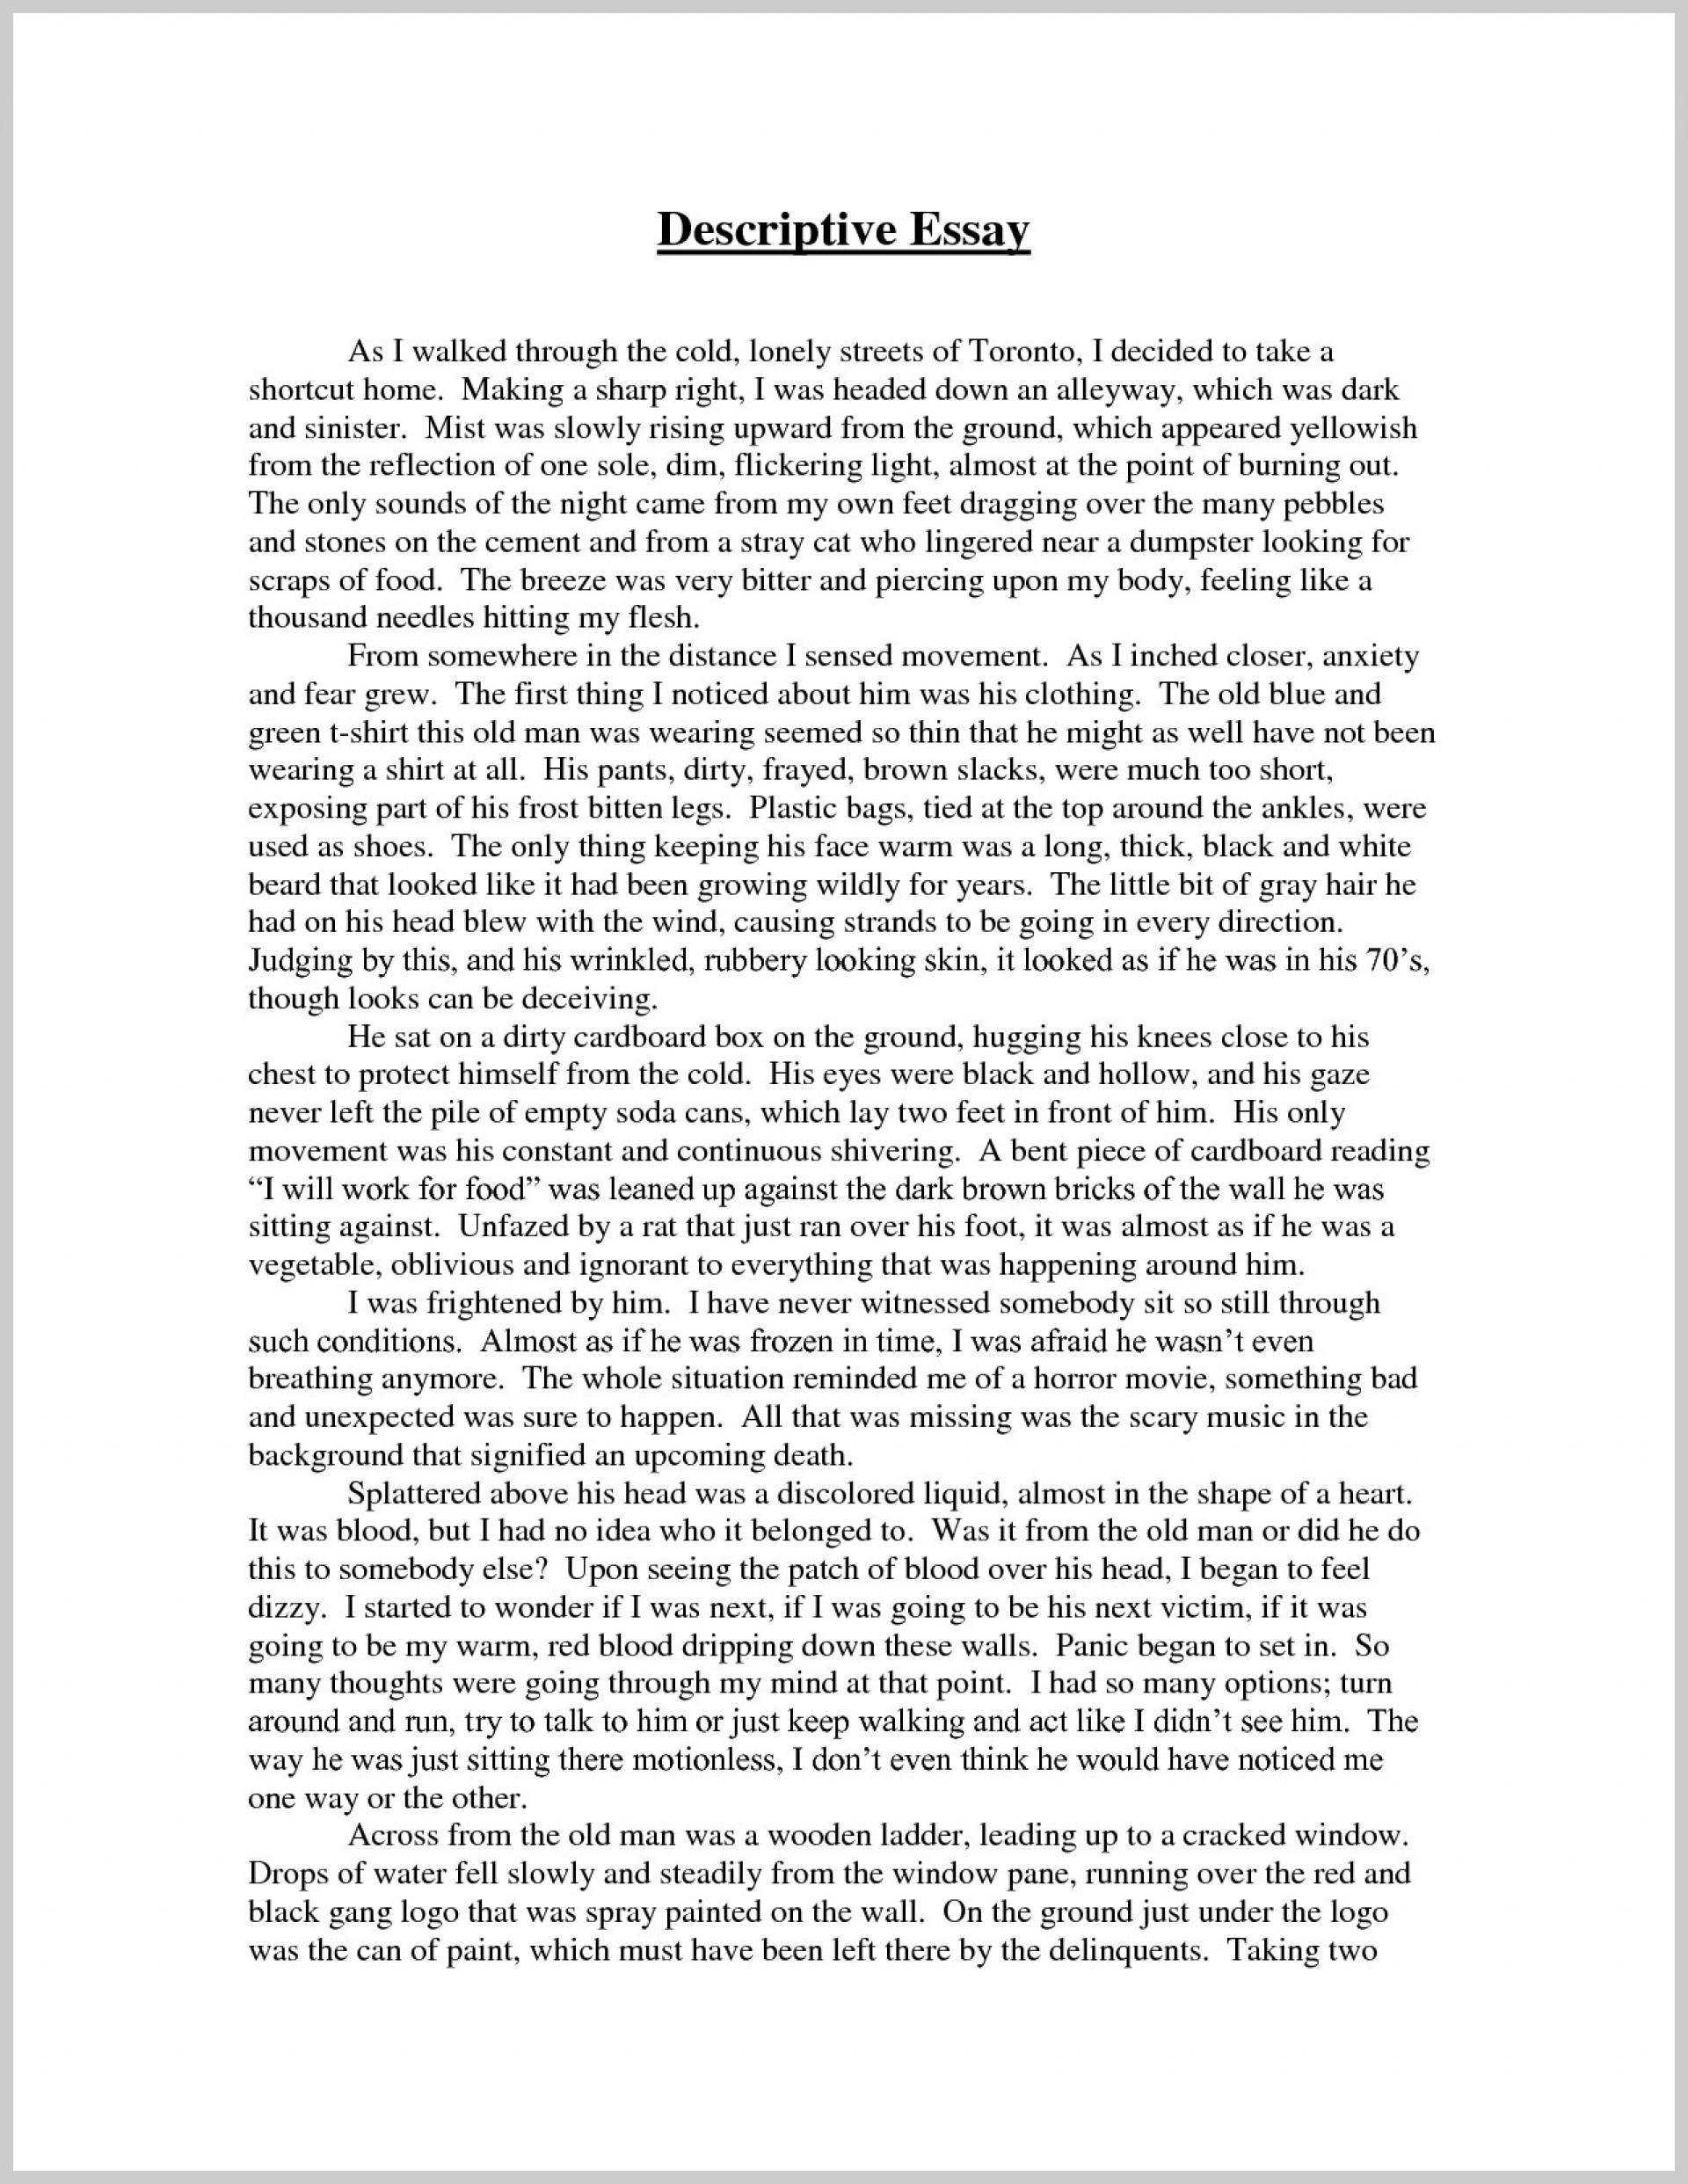 012 Narrative Descriptive Essay Introduction Of Essays Impressive Pdf About Earthquake Outline 1920